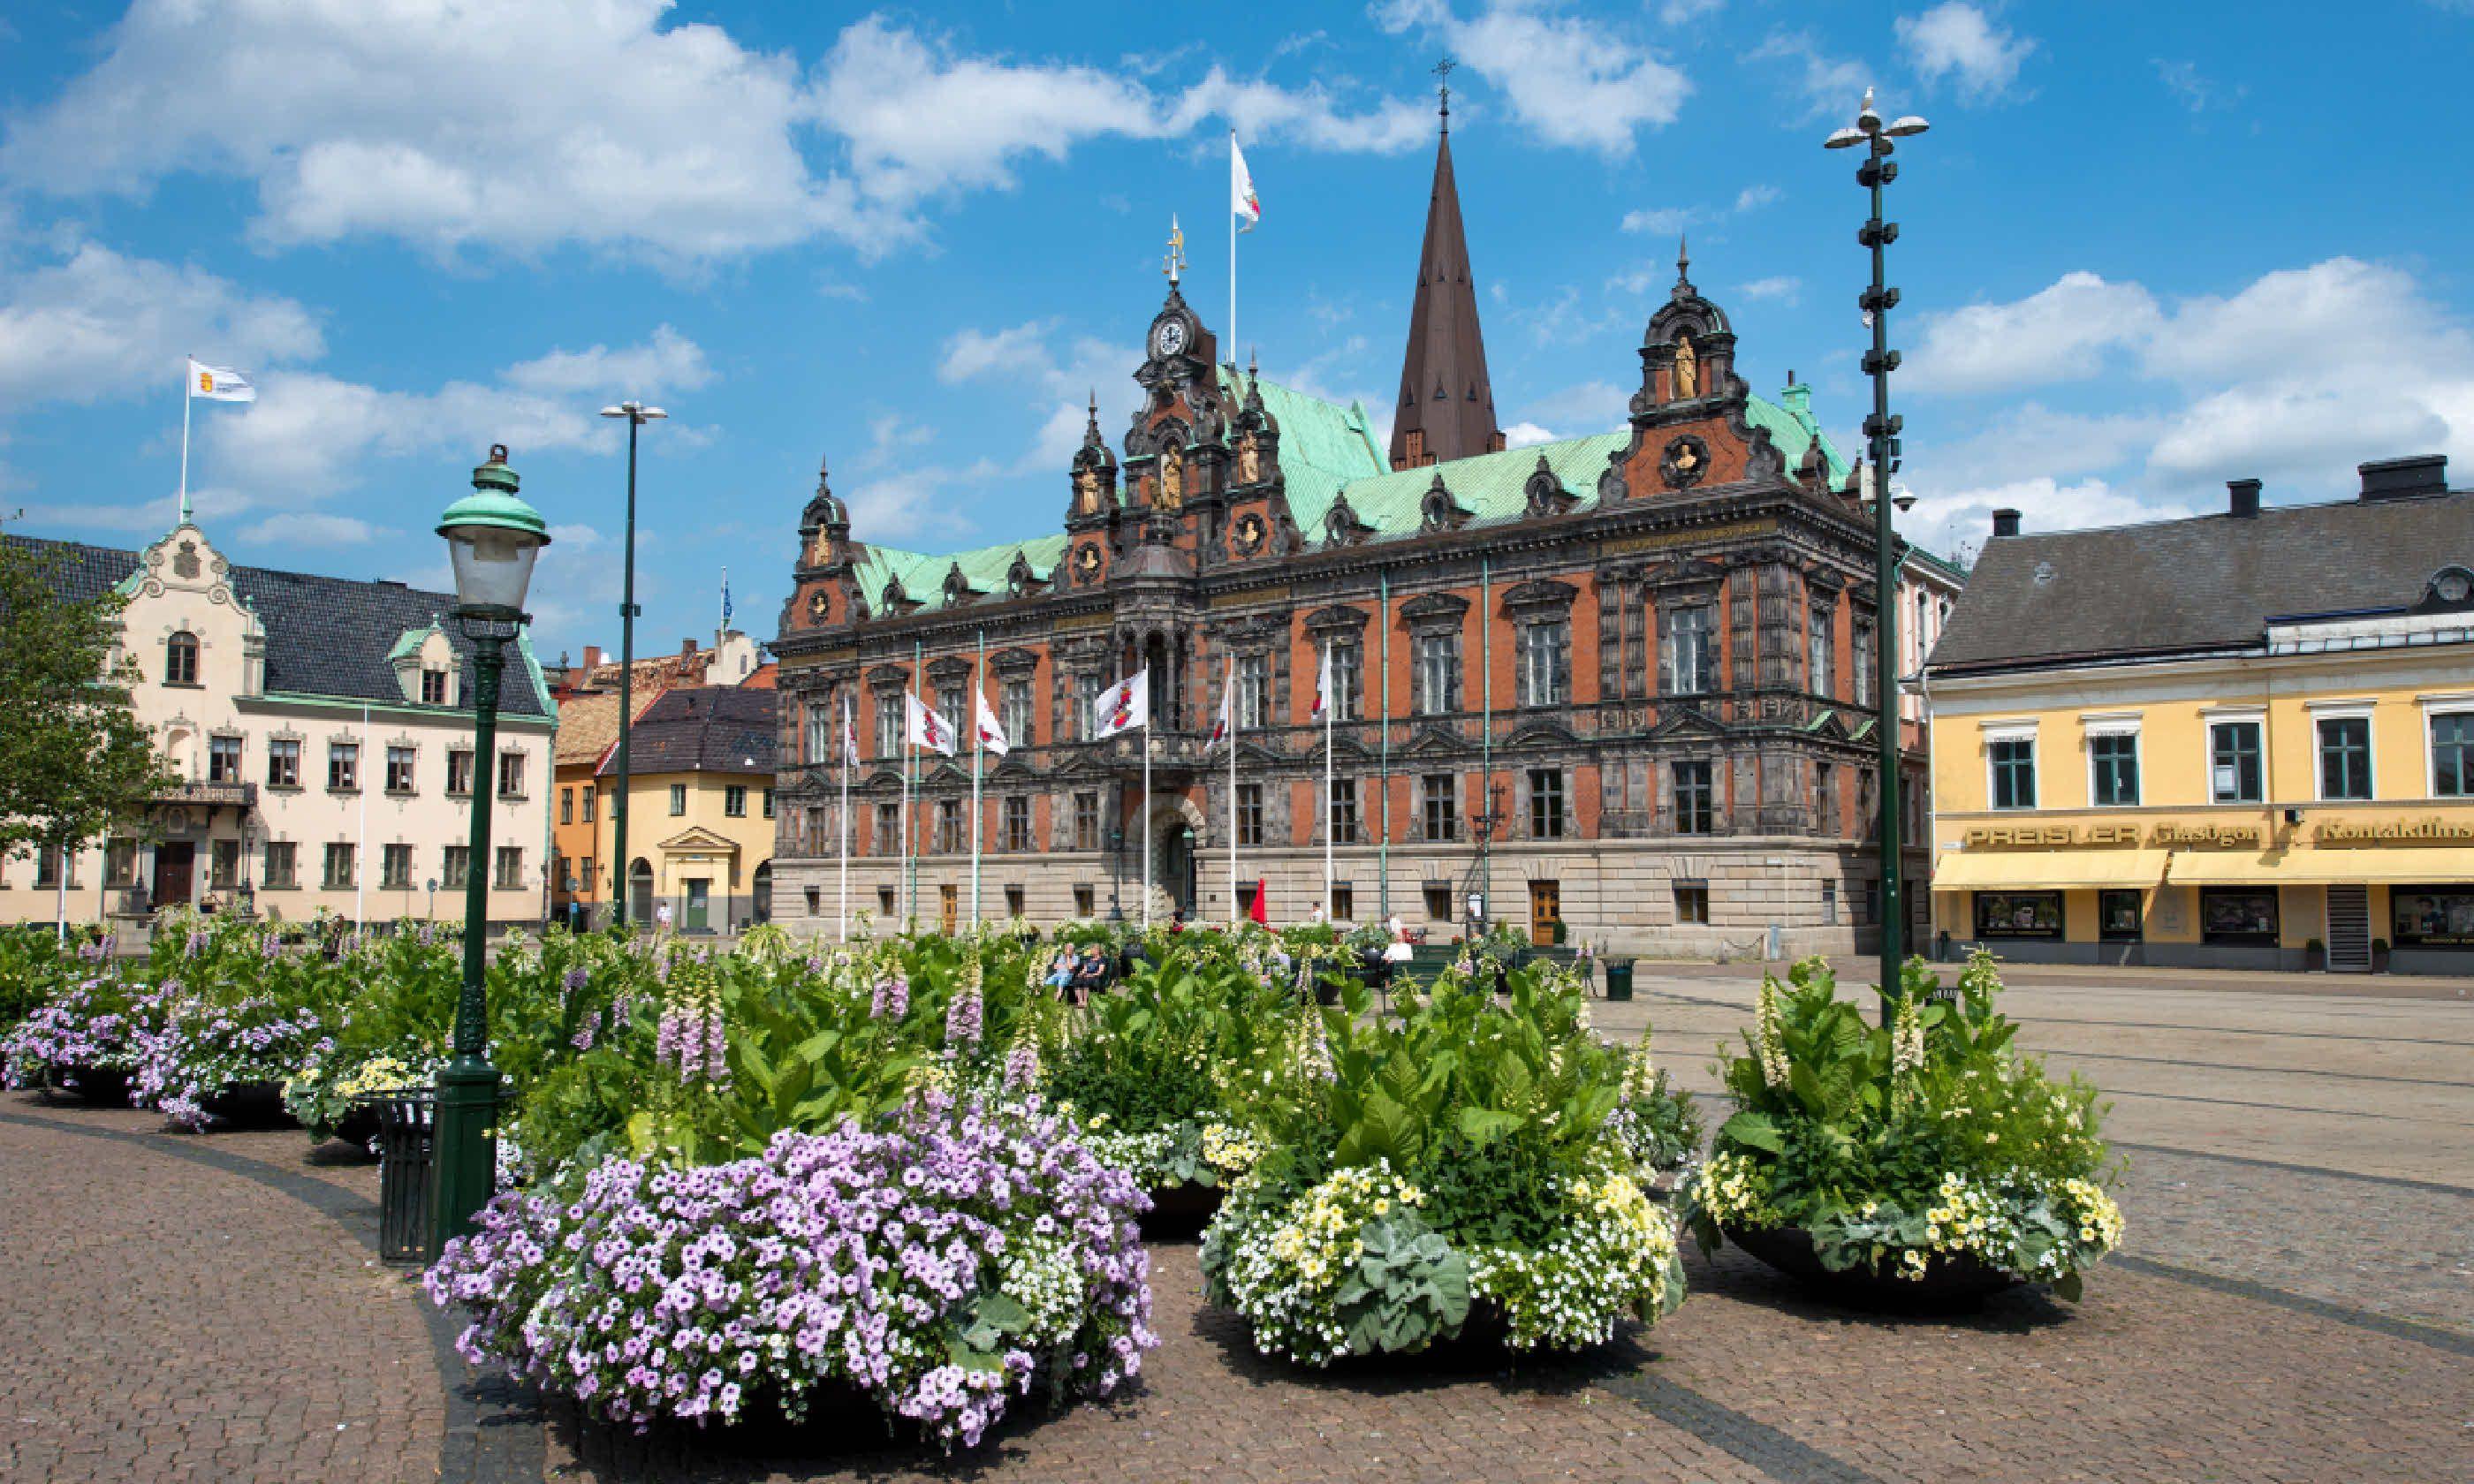 Malmo, Sweden (Shutterstock)